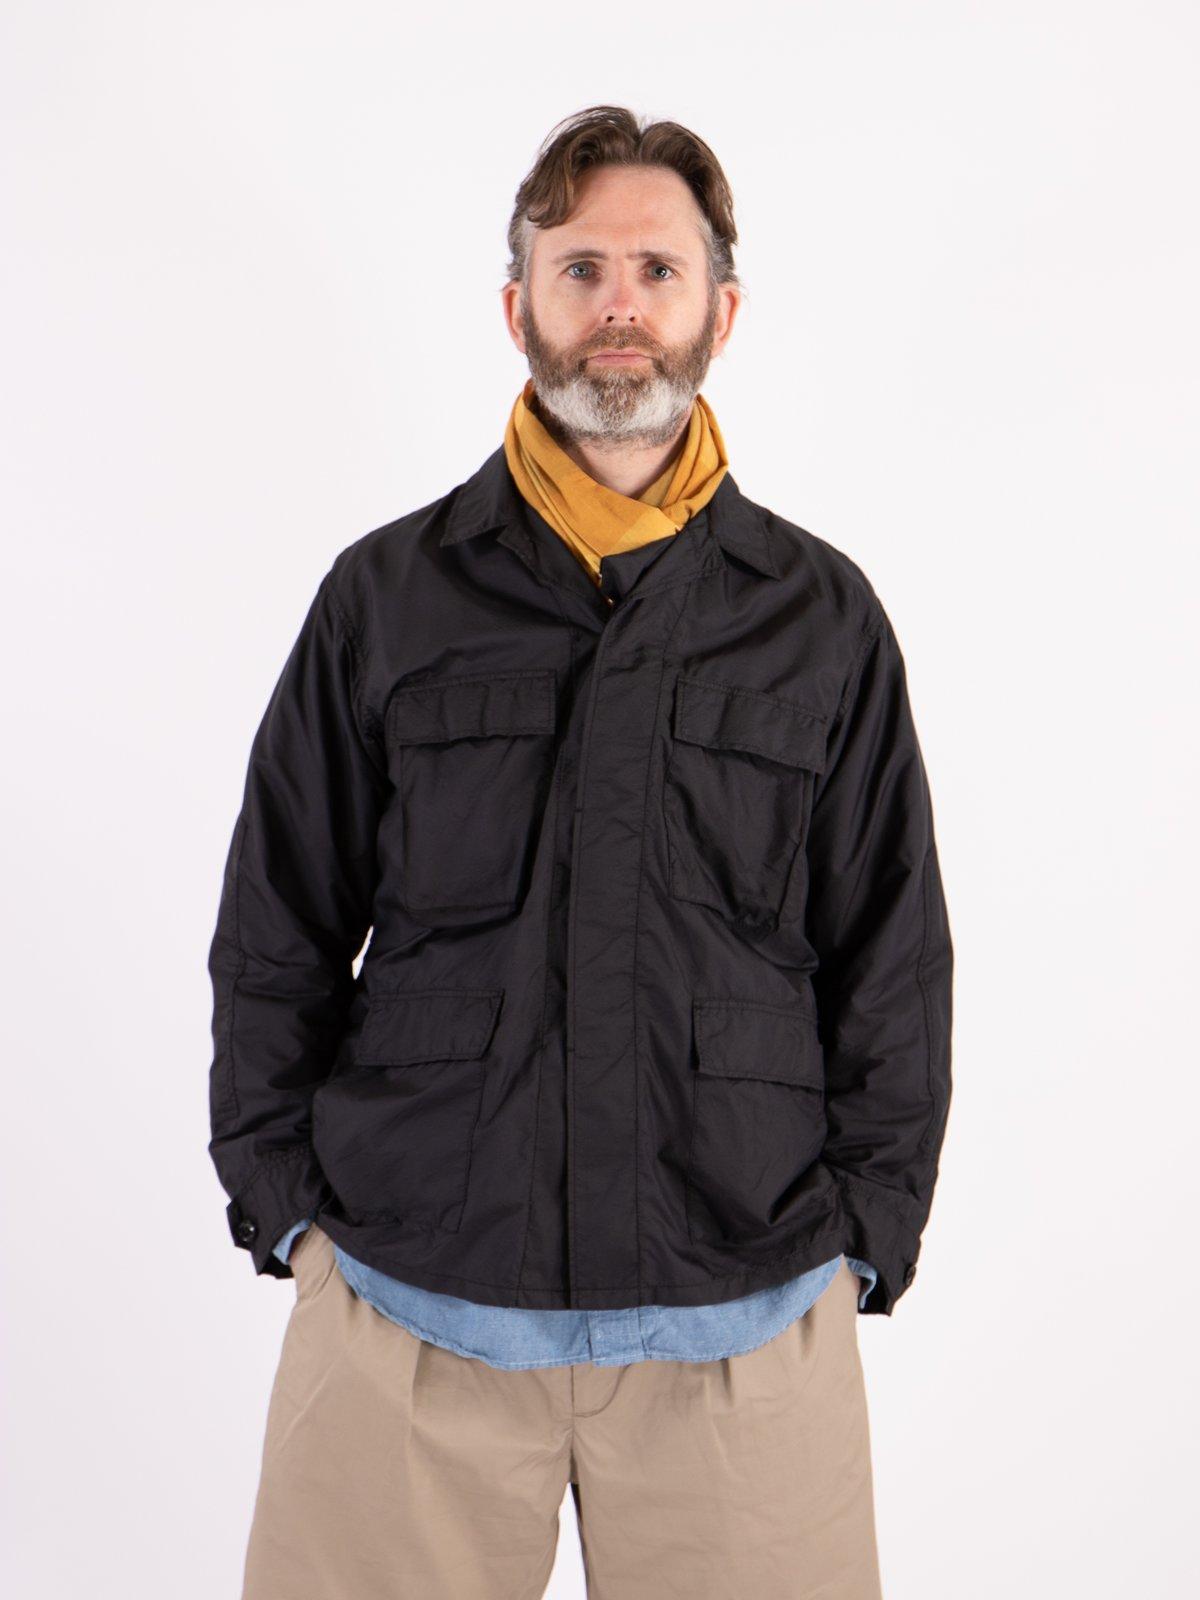 Black Nylon Micro Ripstop BDU Jacket - Image 2